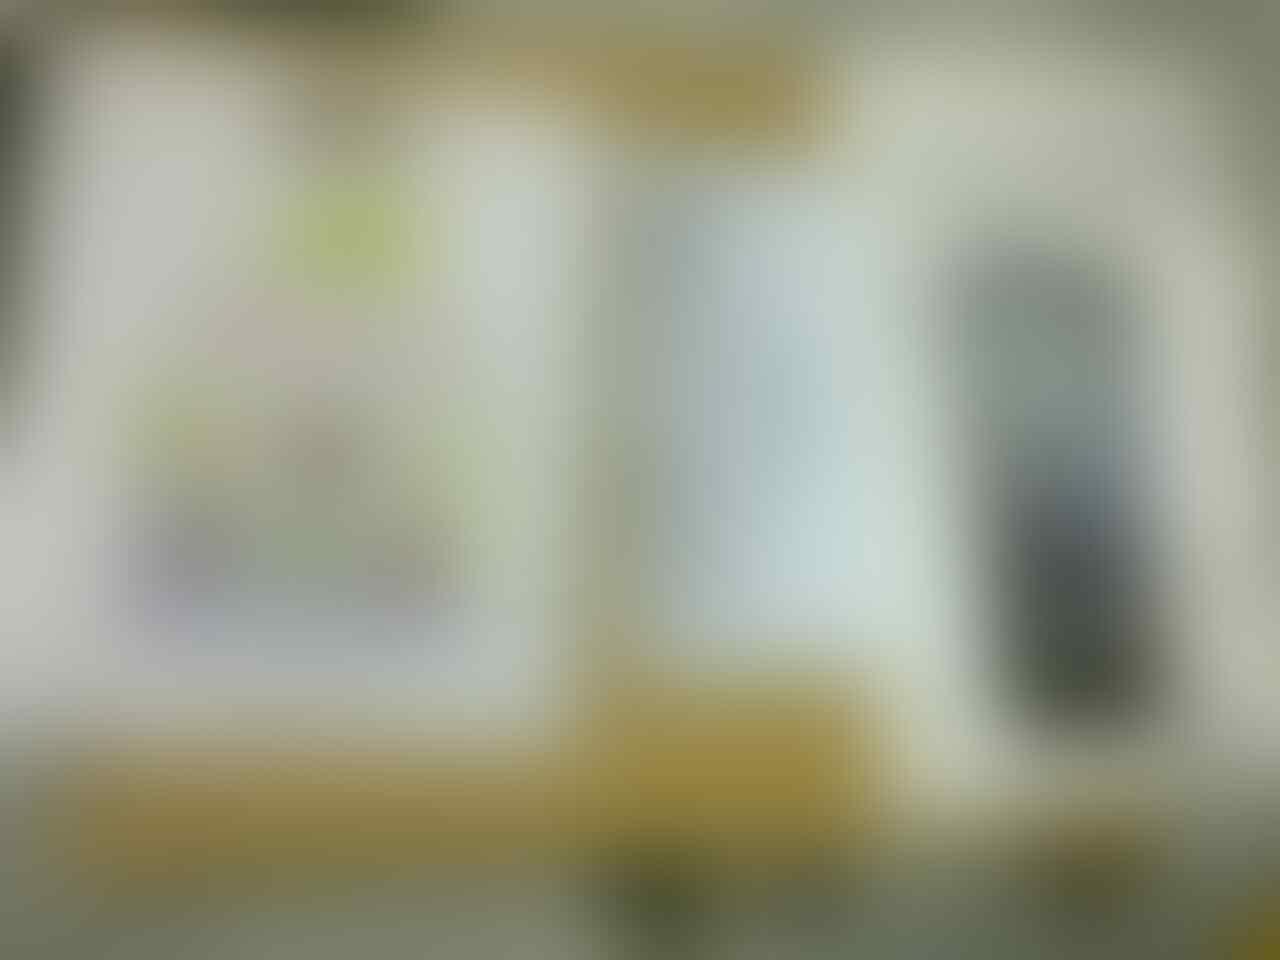 [BEST SELLER] Ultrathin Case 0.3mm iphone 4 / 4s / 5 / 5s /5c